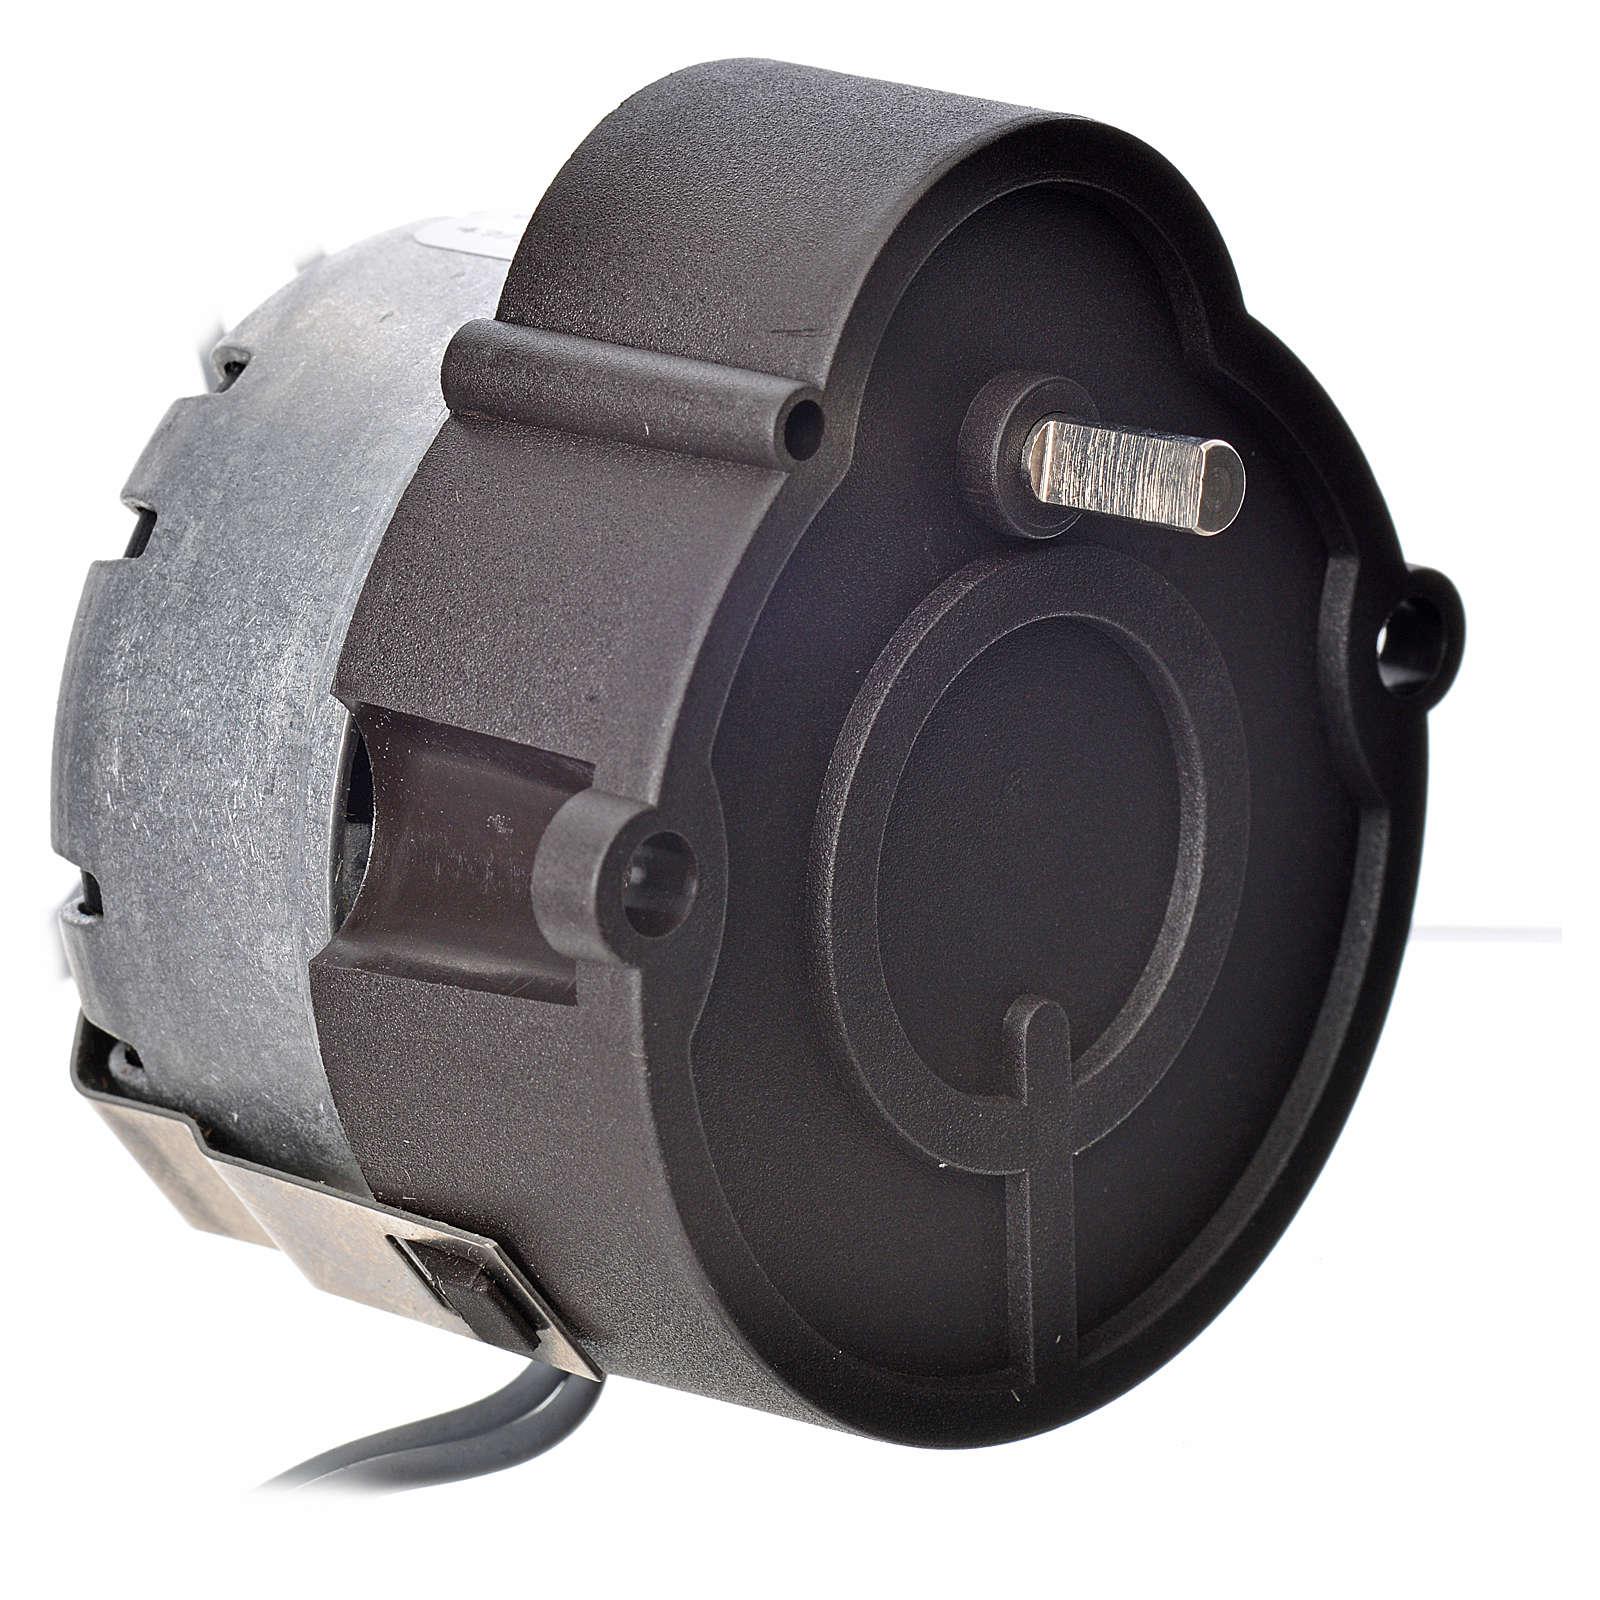 Motoriduttore presepe  MR giri/minuto 1 4